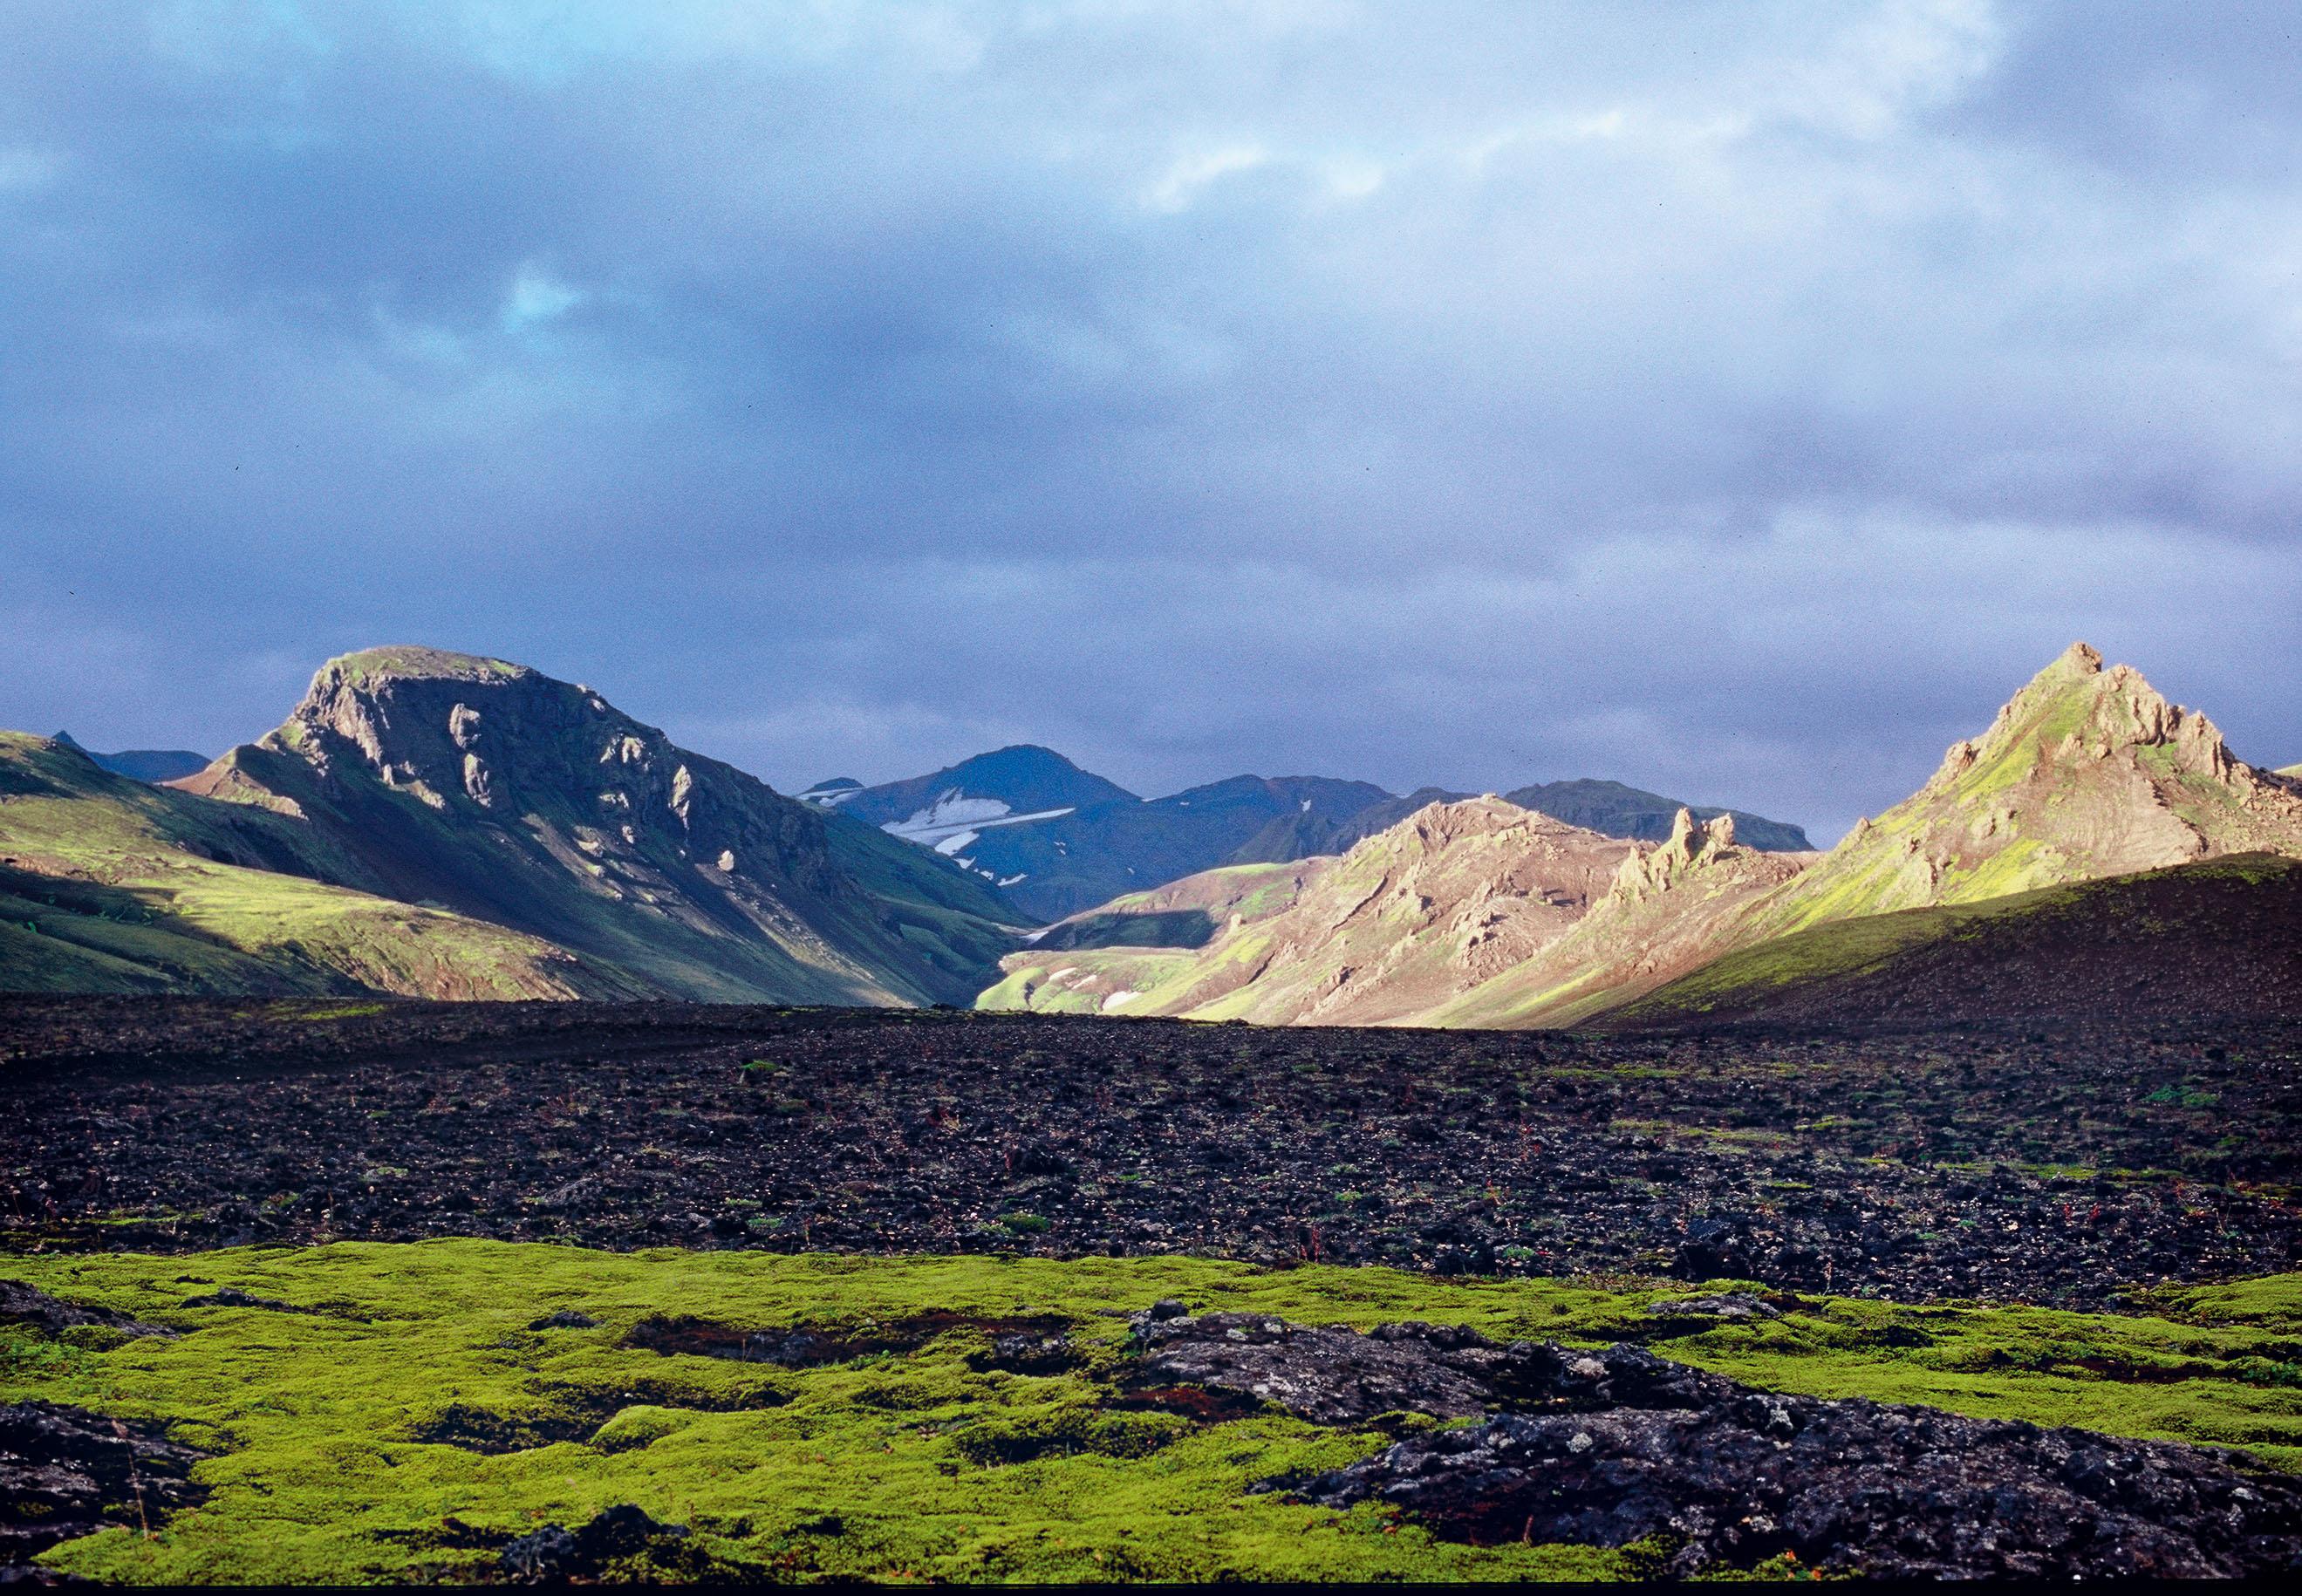 Island, Suedisland, Hochland, Landmannalaugar, bunte Berge, Ryholit, Moos, gruen